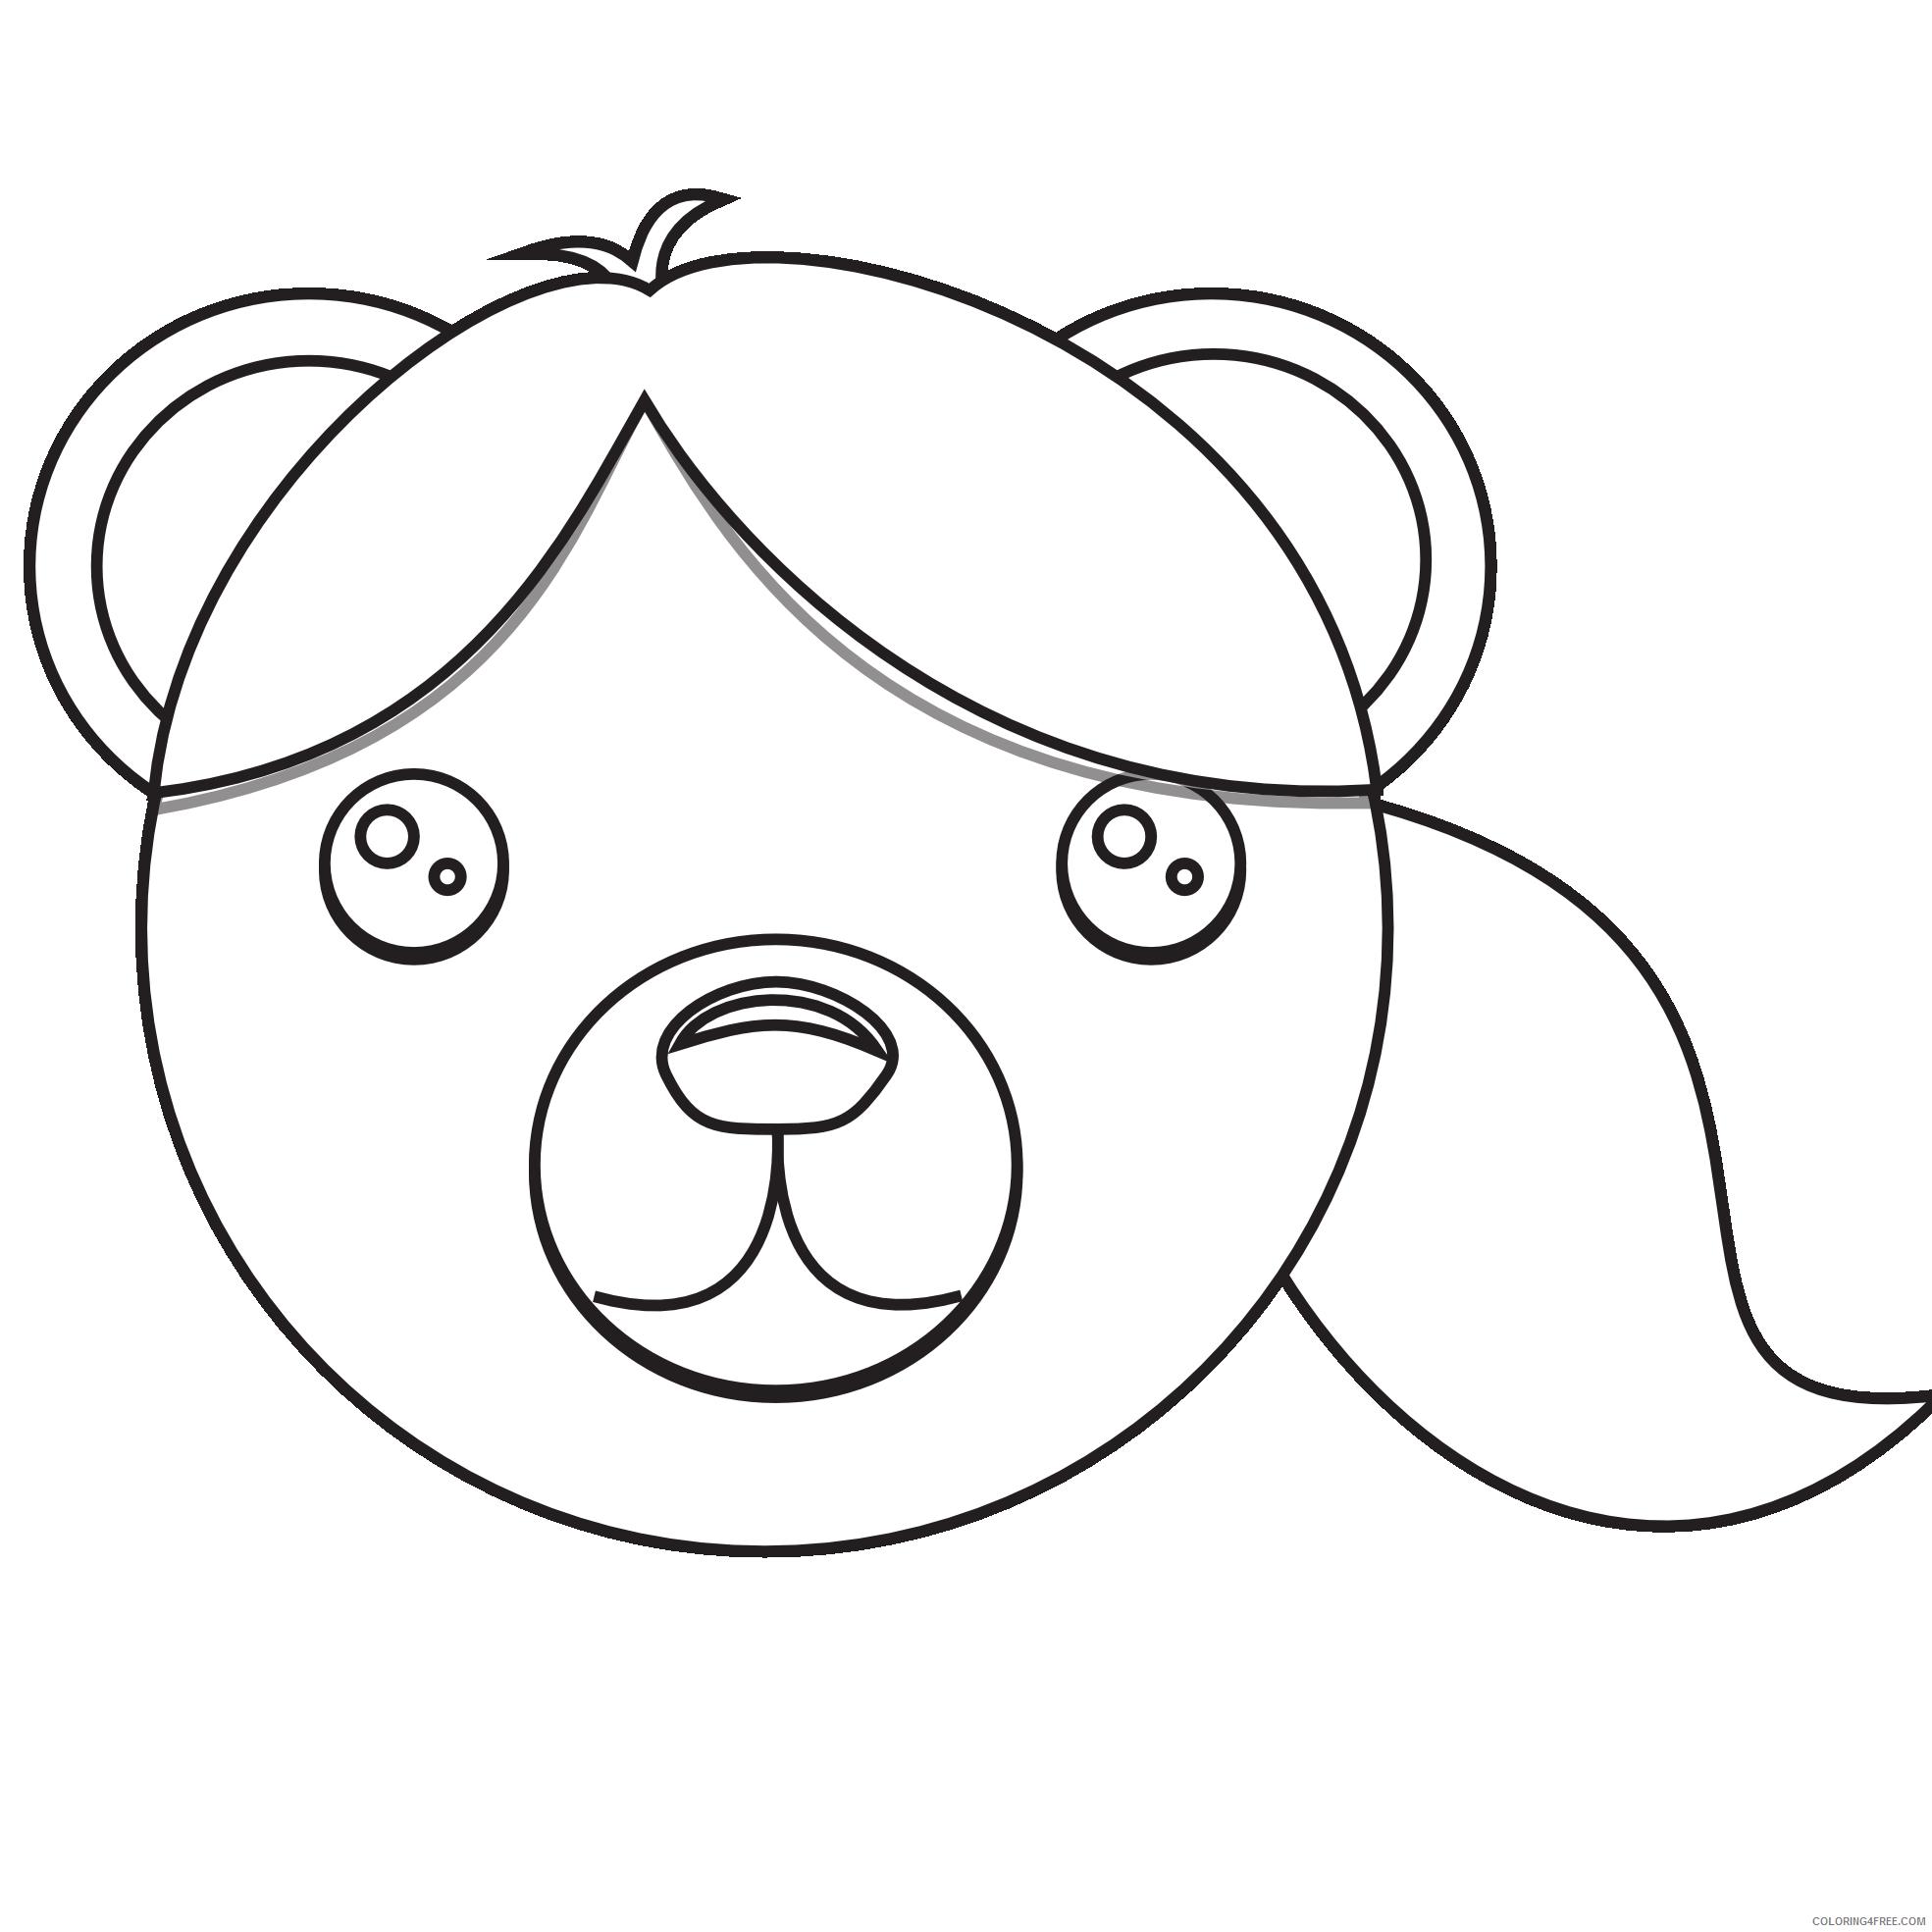 brown bear black white line art coloring book colouring coloring book qxd7nv coloring